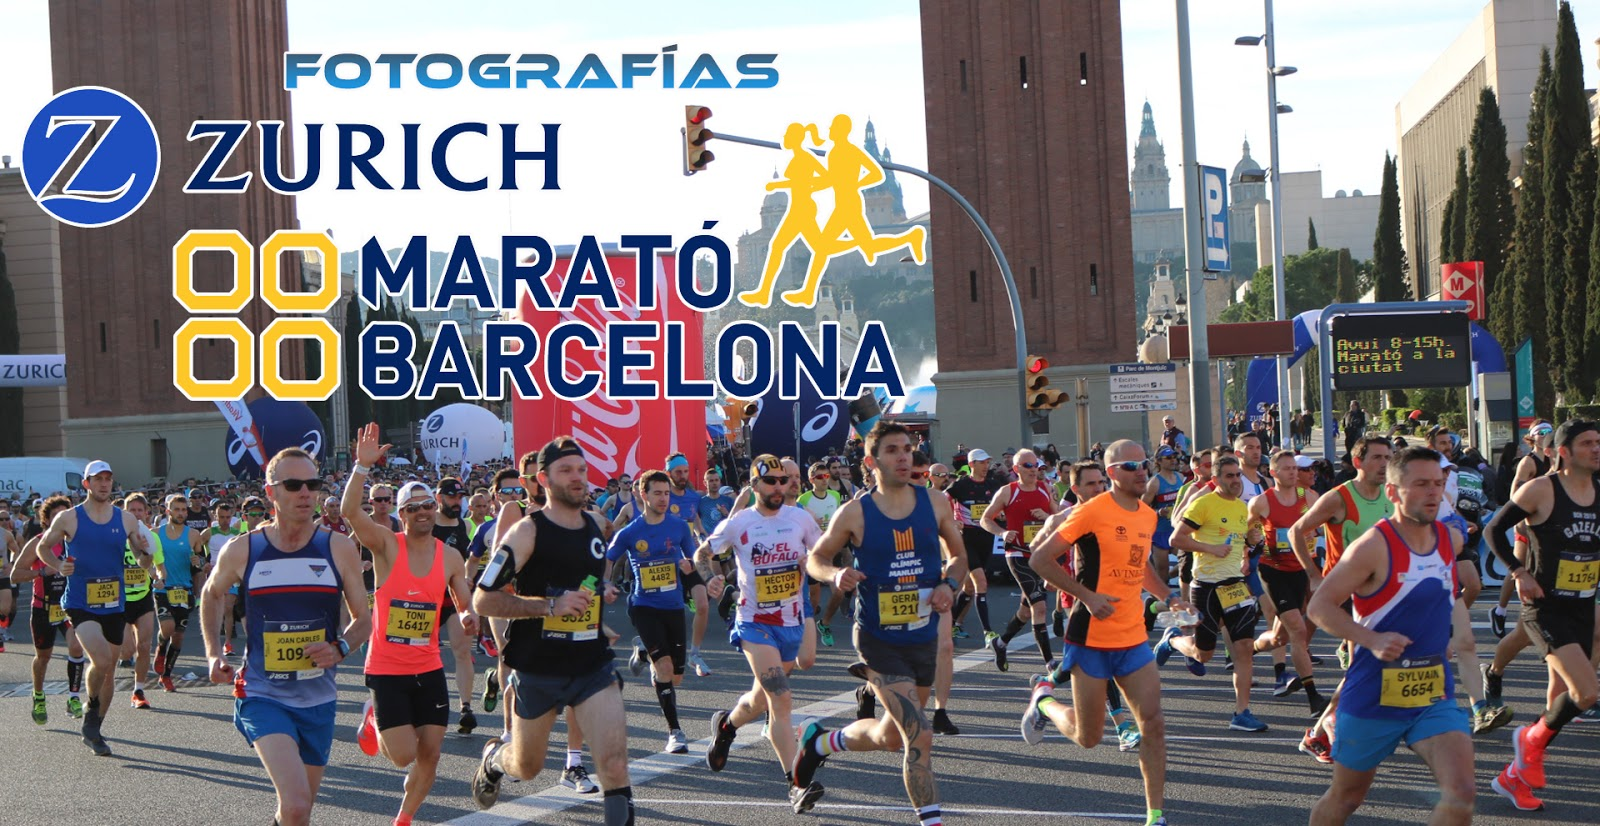 Fotografías Zurich Marató Barcelona 2019